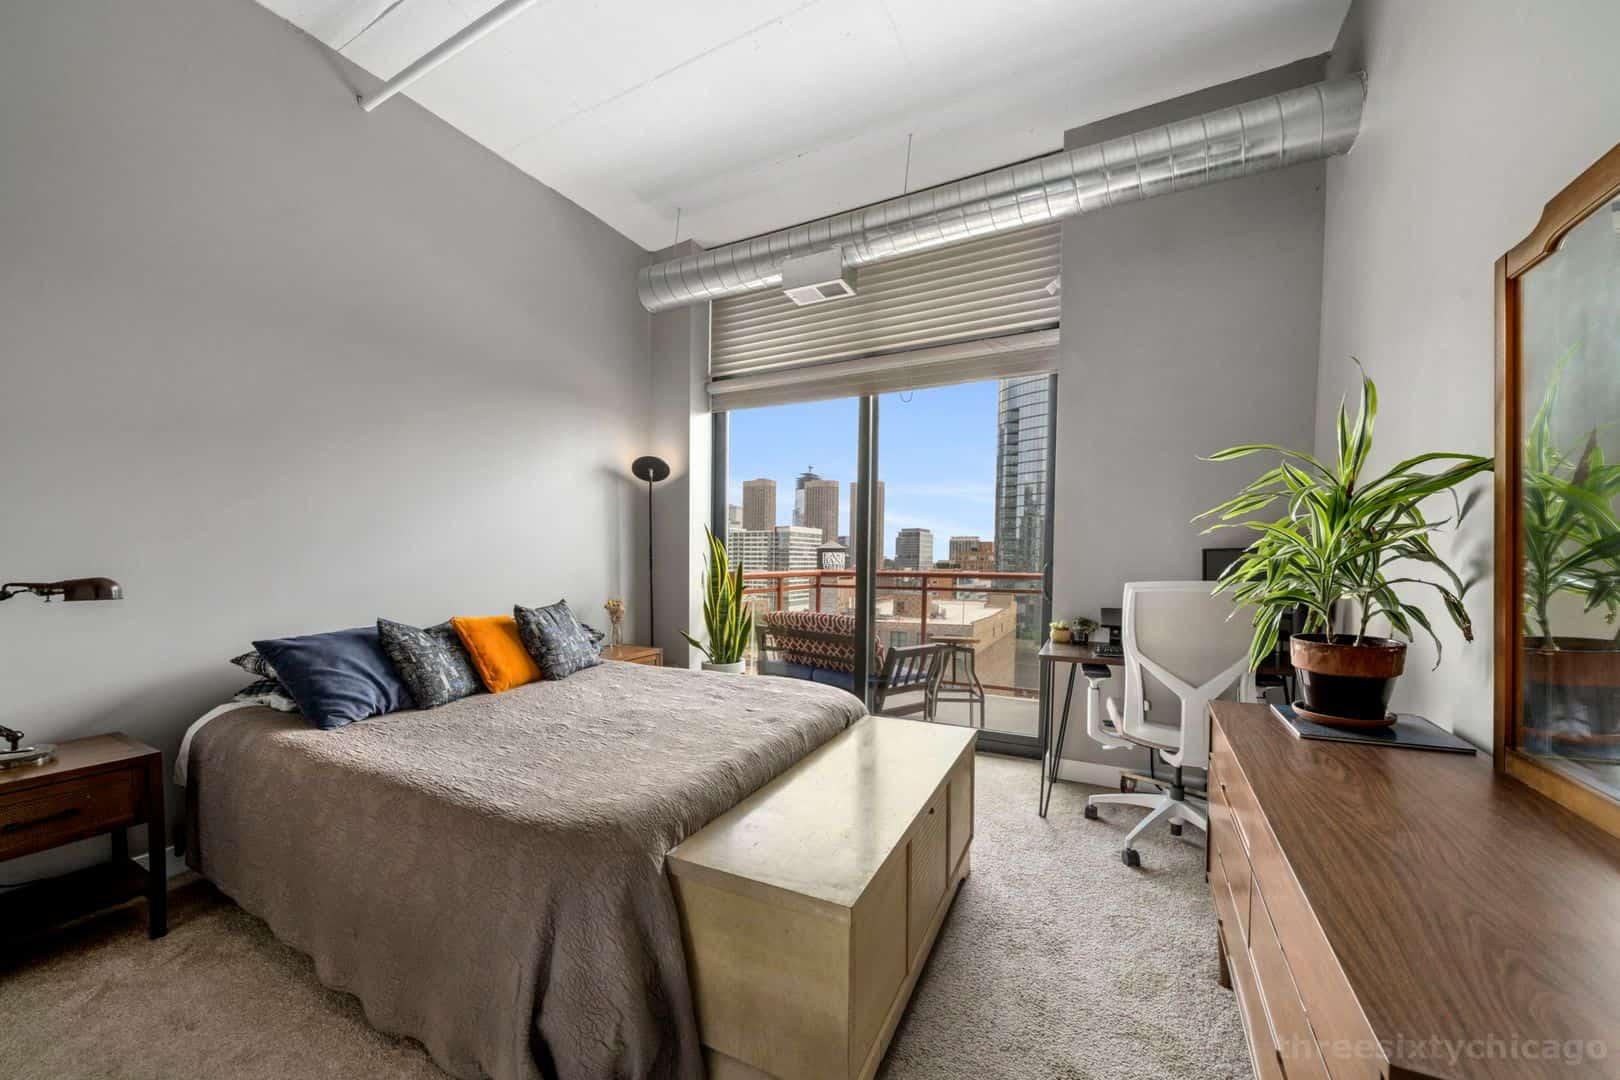 740 W Fulton, Unit 1102 - Main bedroom